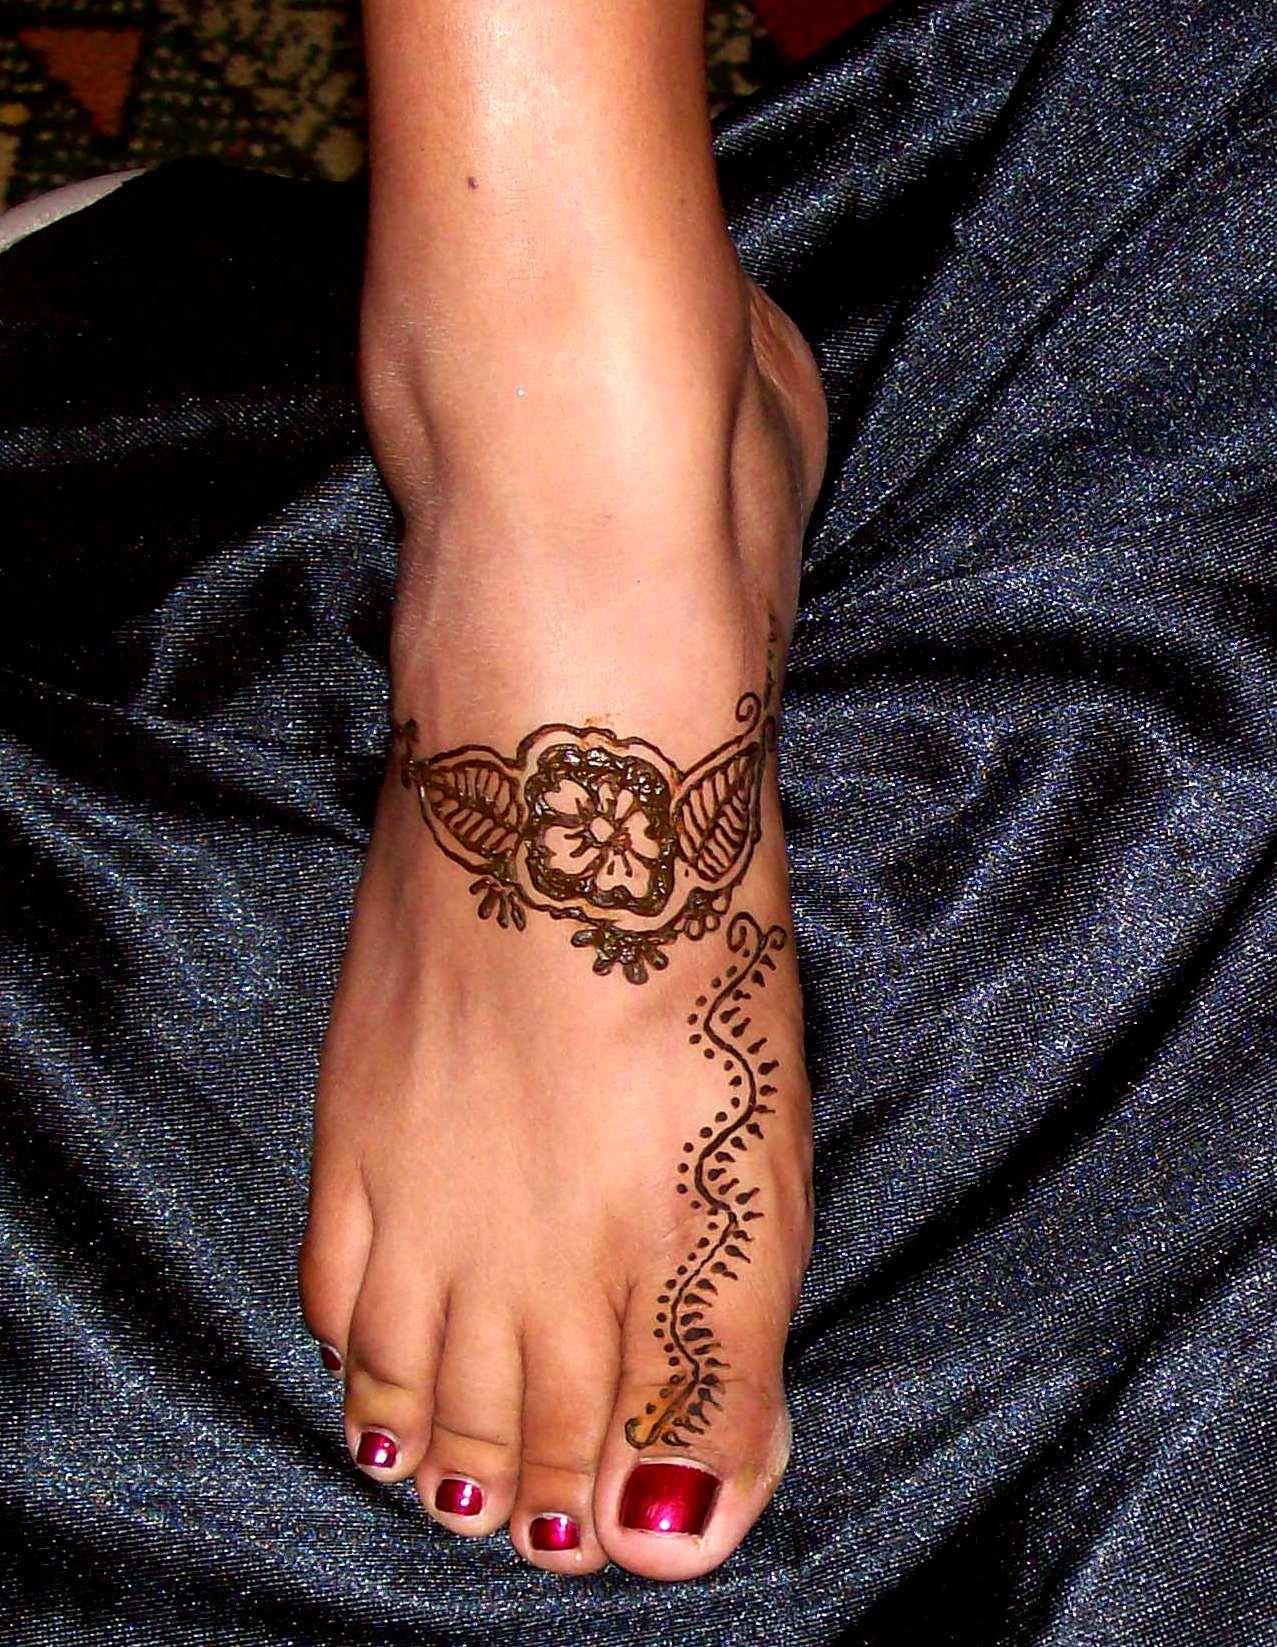 9a3e78d0b Henna Tattoos Designs